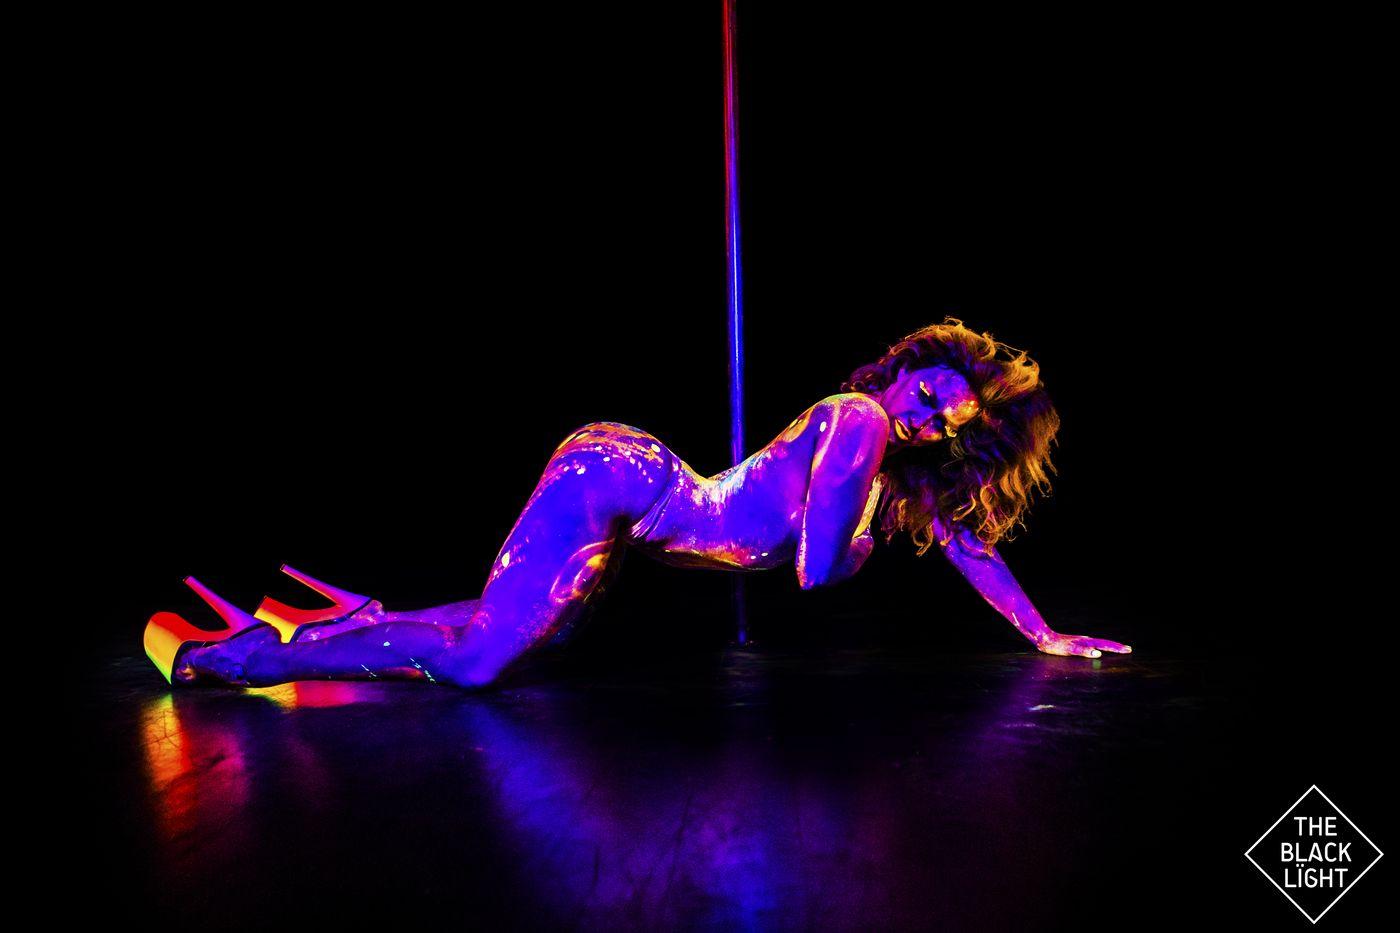 The Black Light - Magda Neon 3511 small.jpg